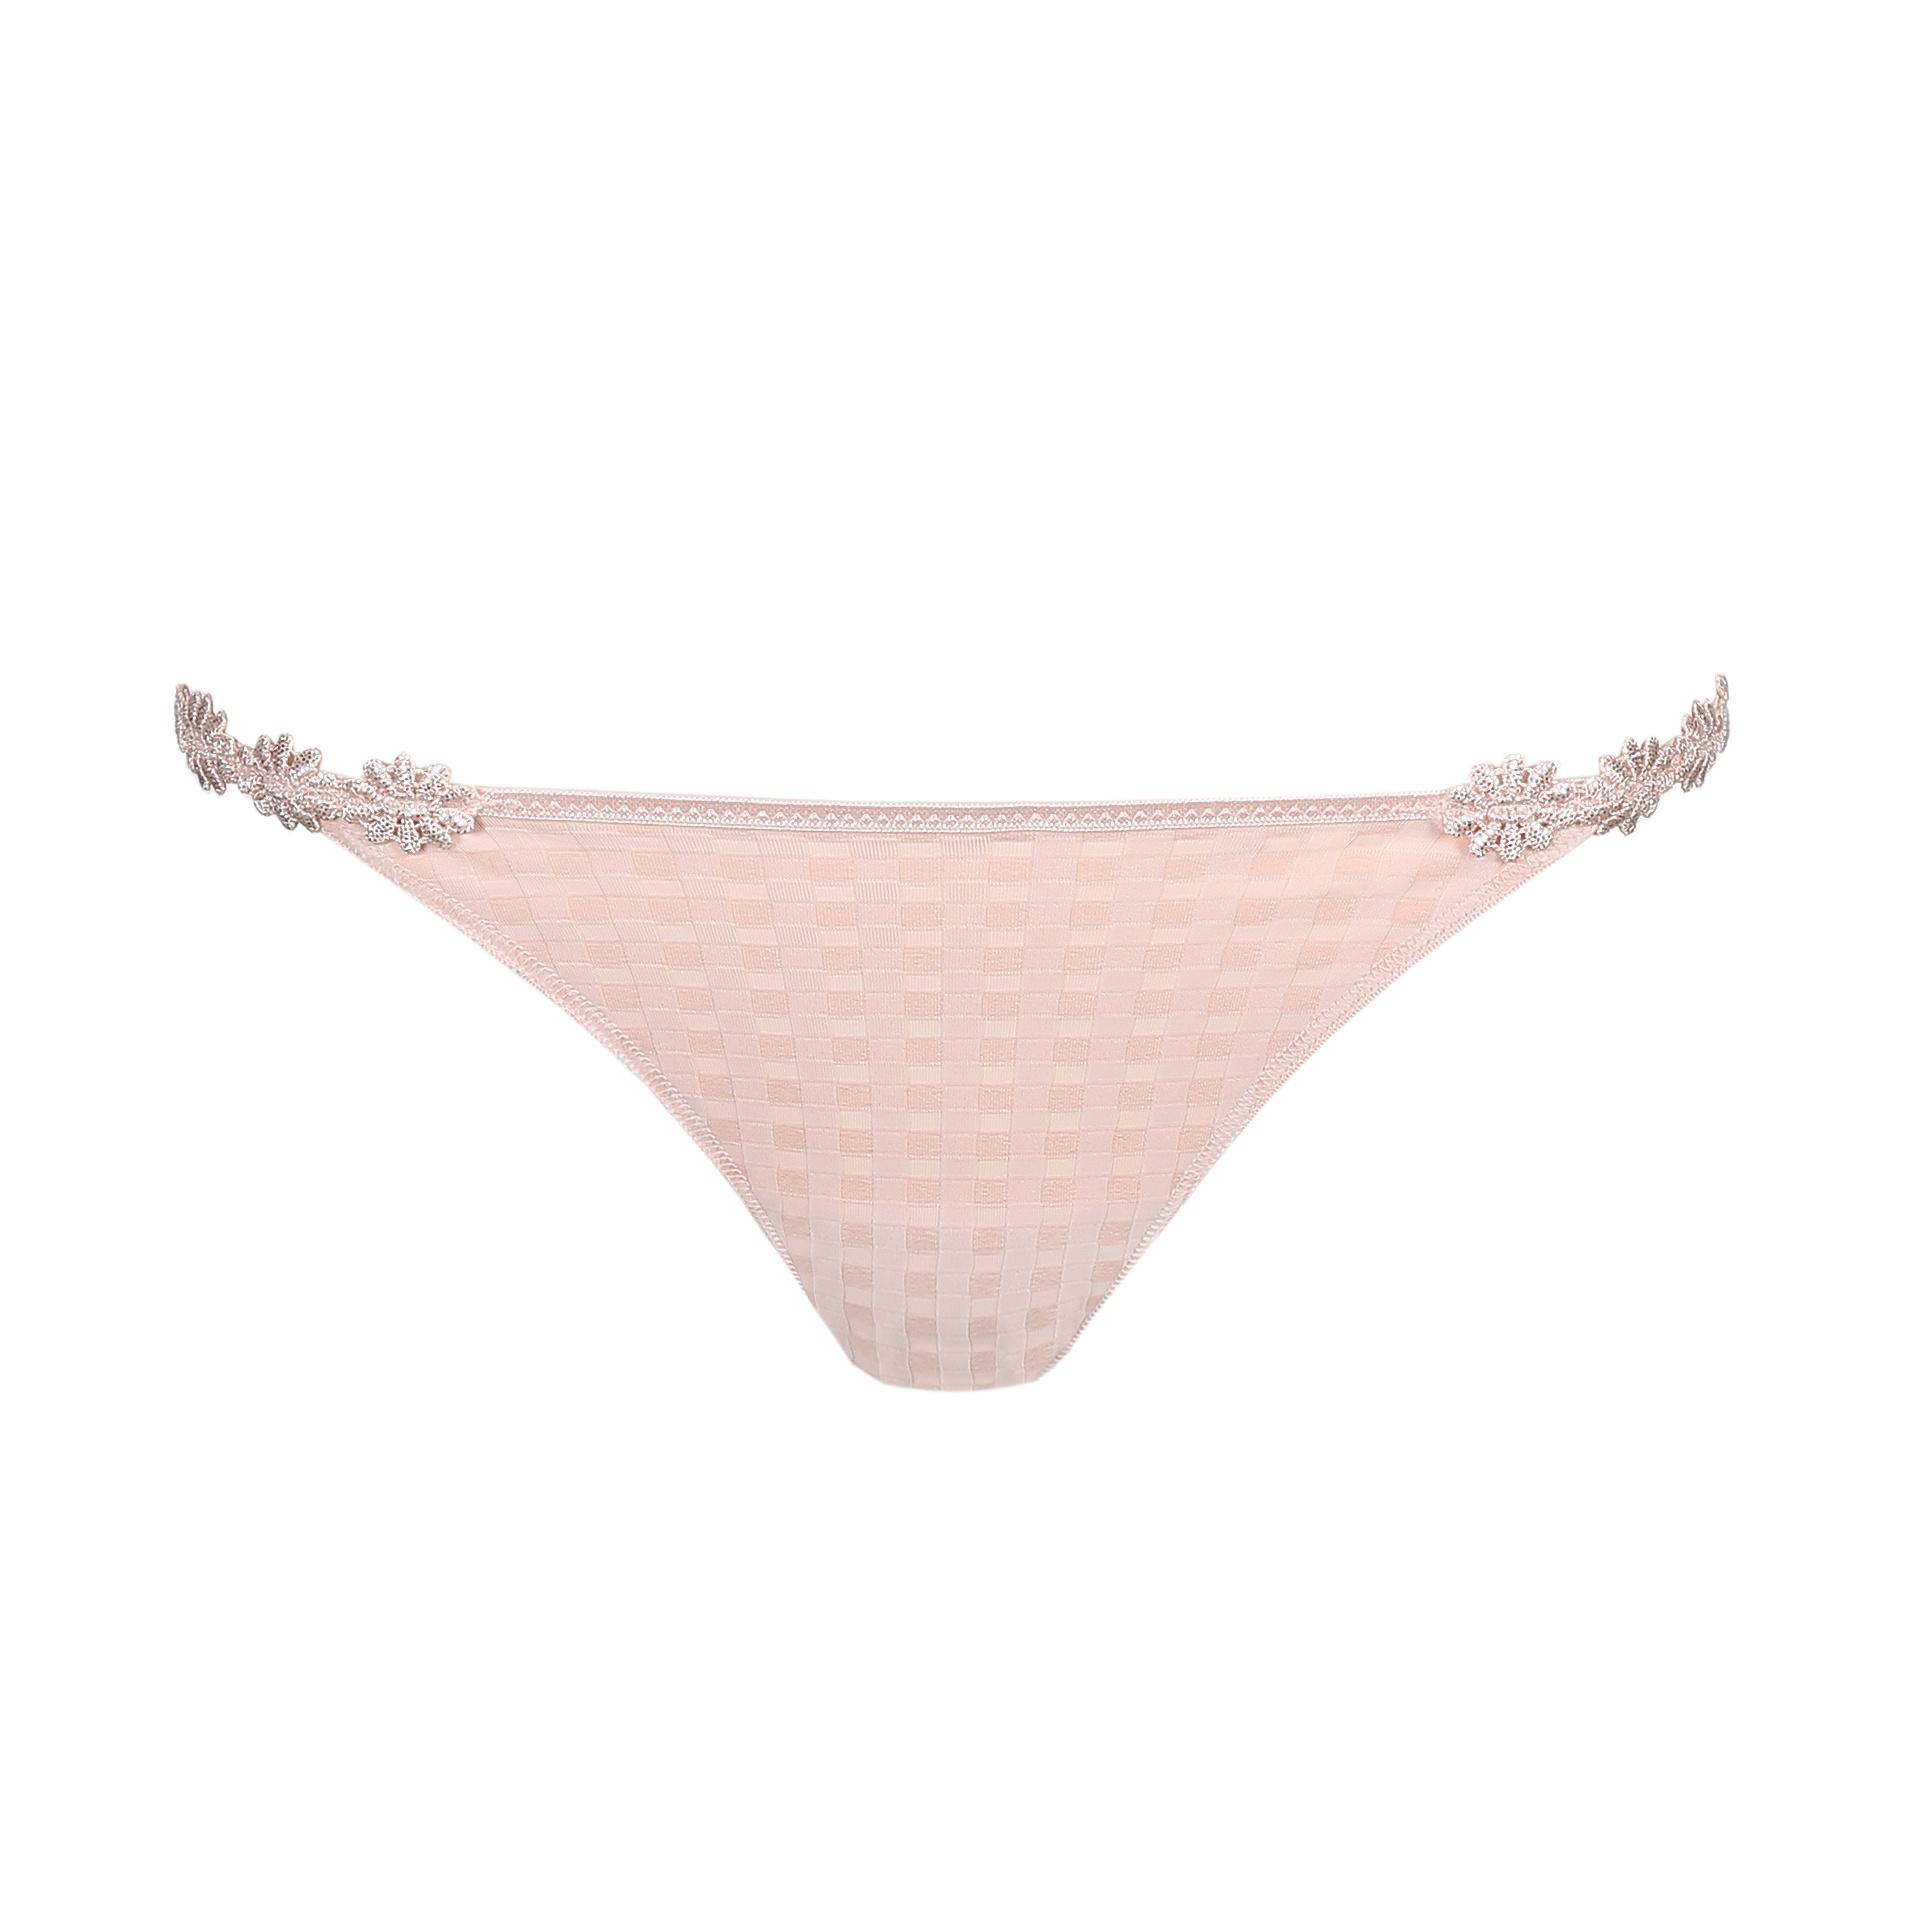 Marie Jo Marie Jo Avero heupslip 36-42 pearly pink